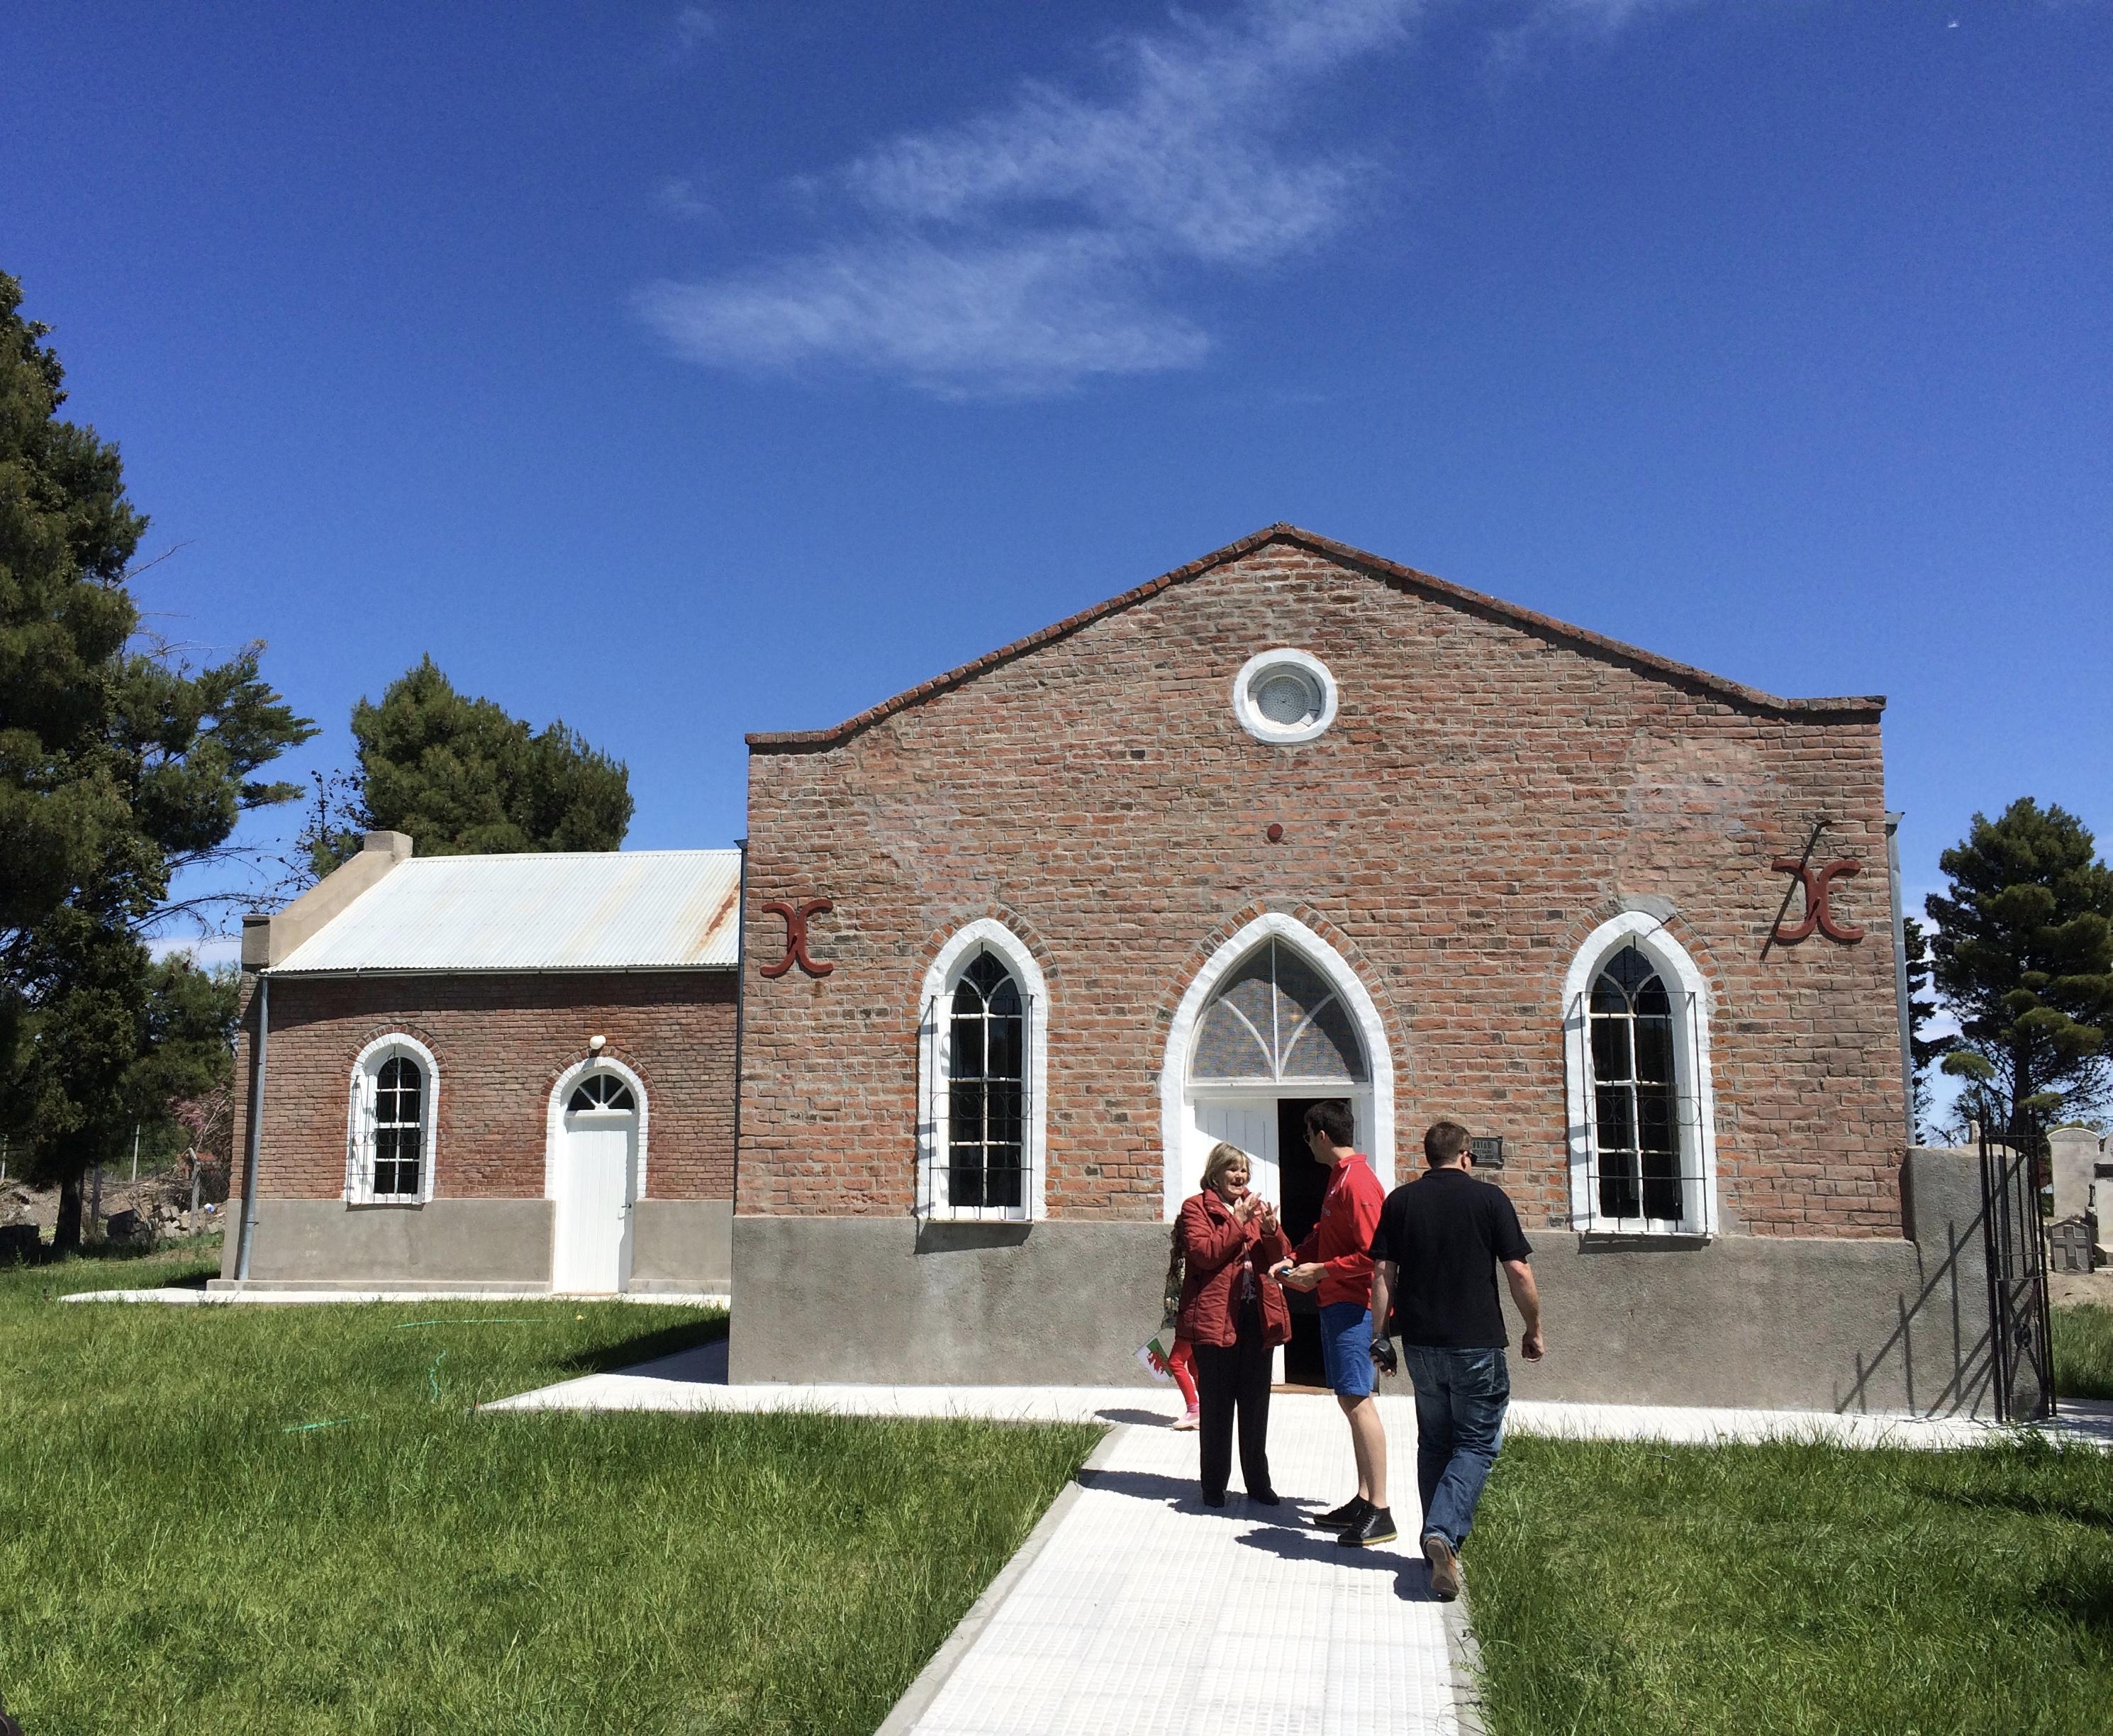 Moriah Chapel, near Trelew